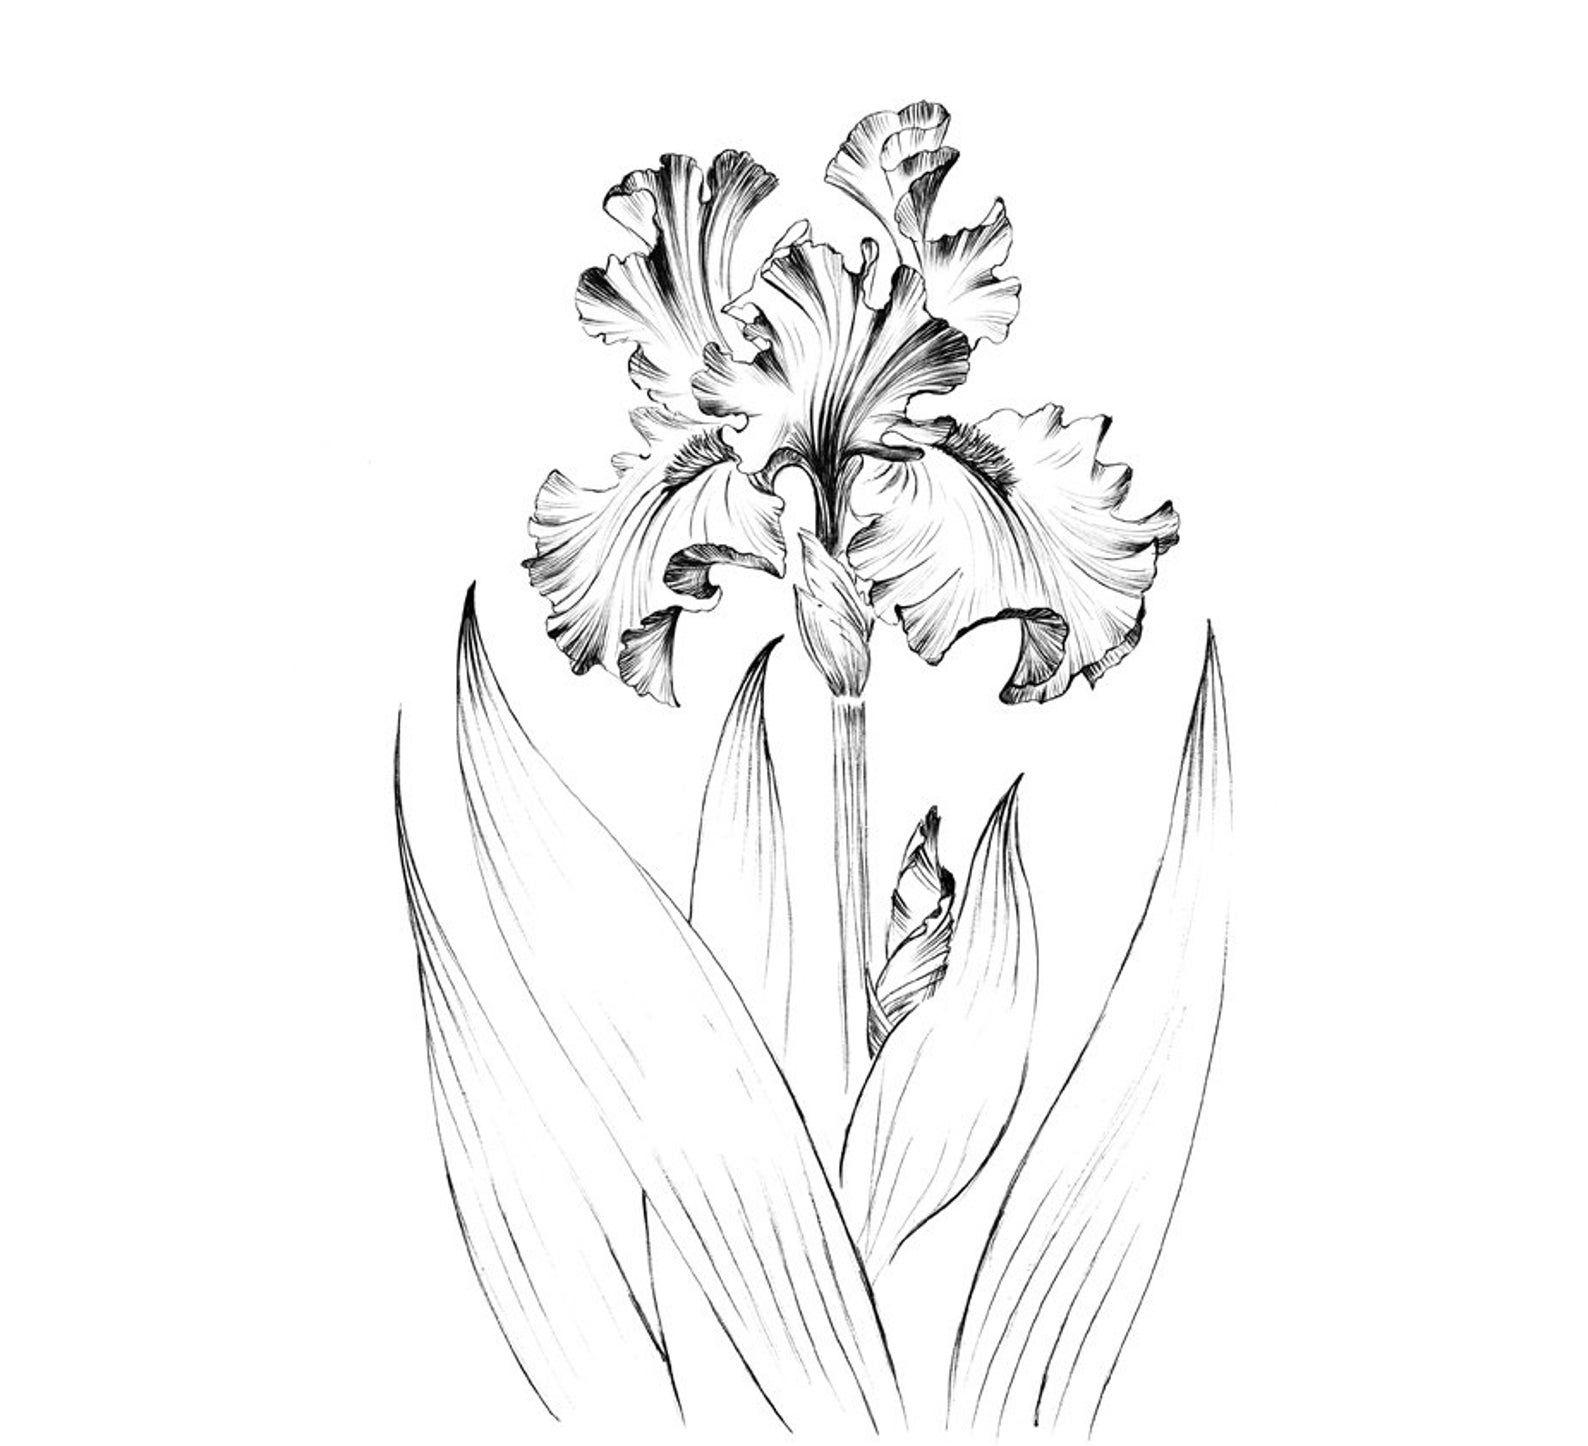 Iris Flower Sketch Living Room Art Large Print Clip Art Etsy In 2020 Flower Sketches Iris Flowers Floral Poster